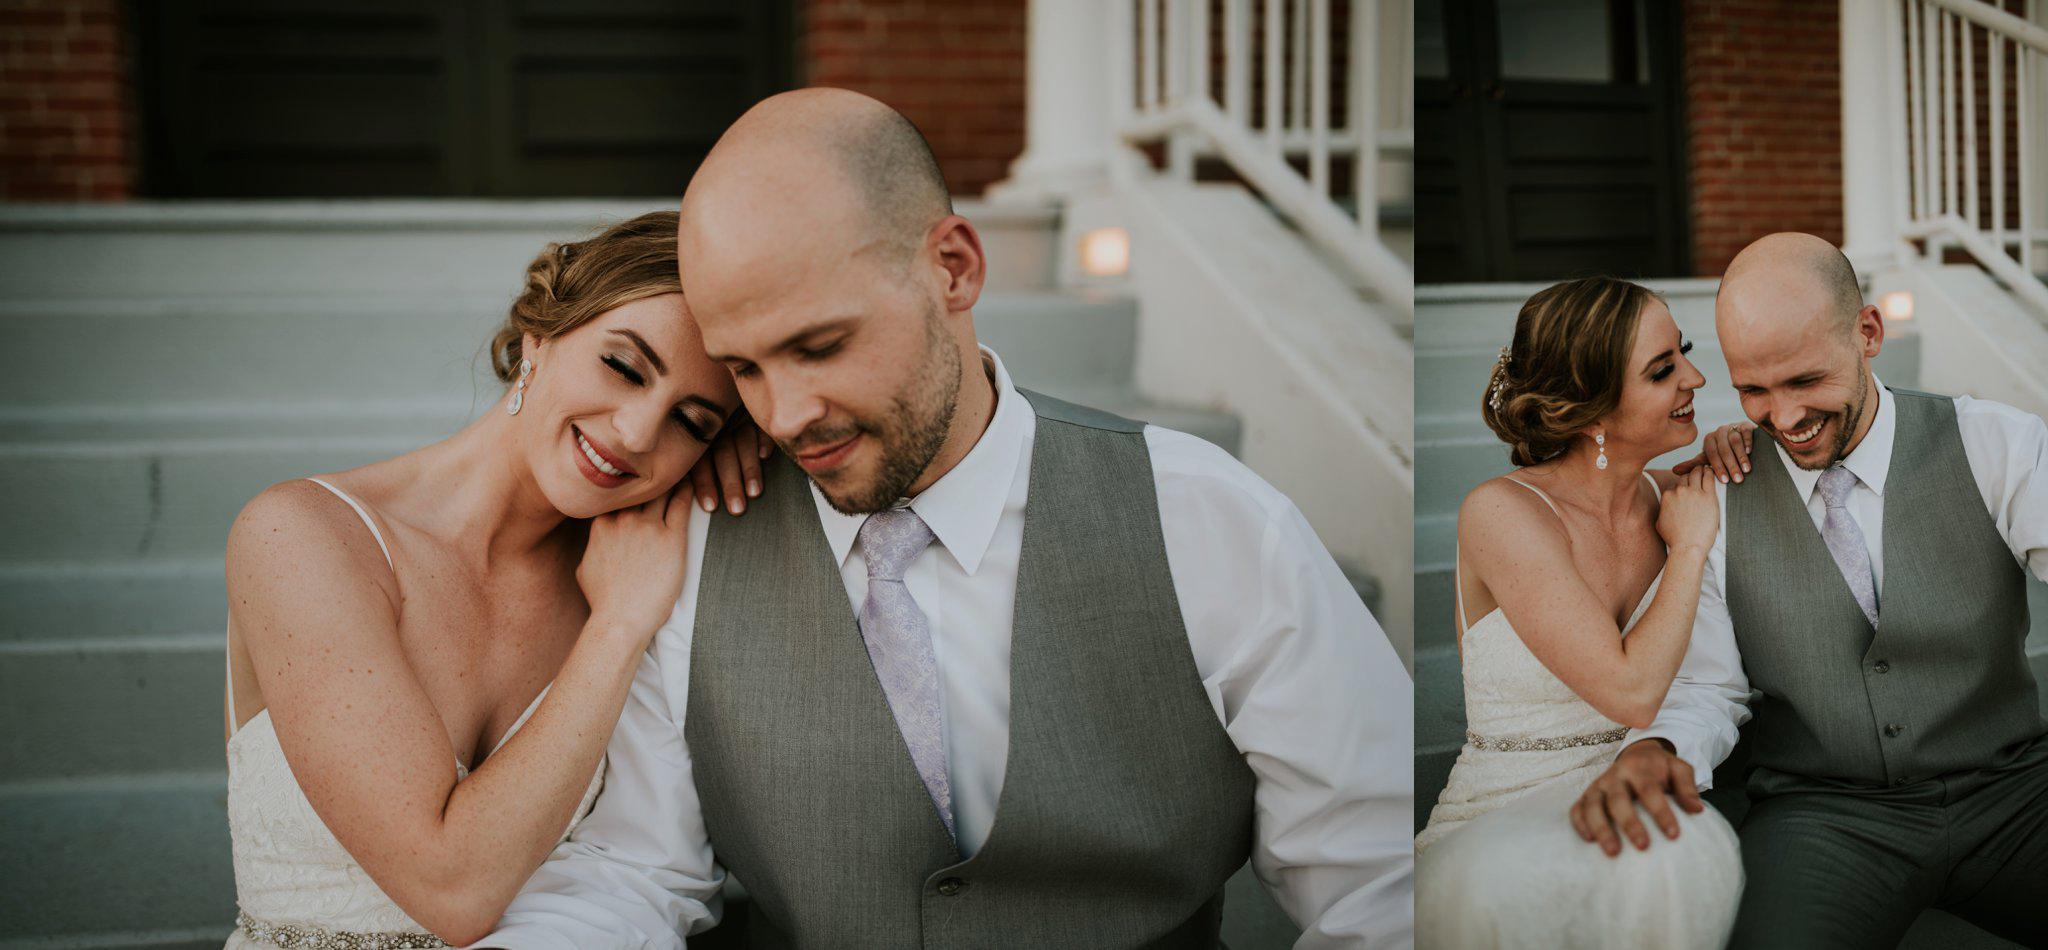 hollywood-school-house-wedding-seattle-photographer-caitlyn-nikula-106.jpg